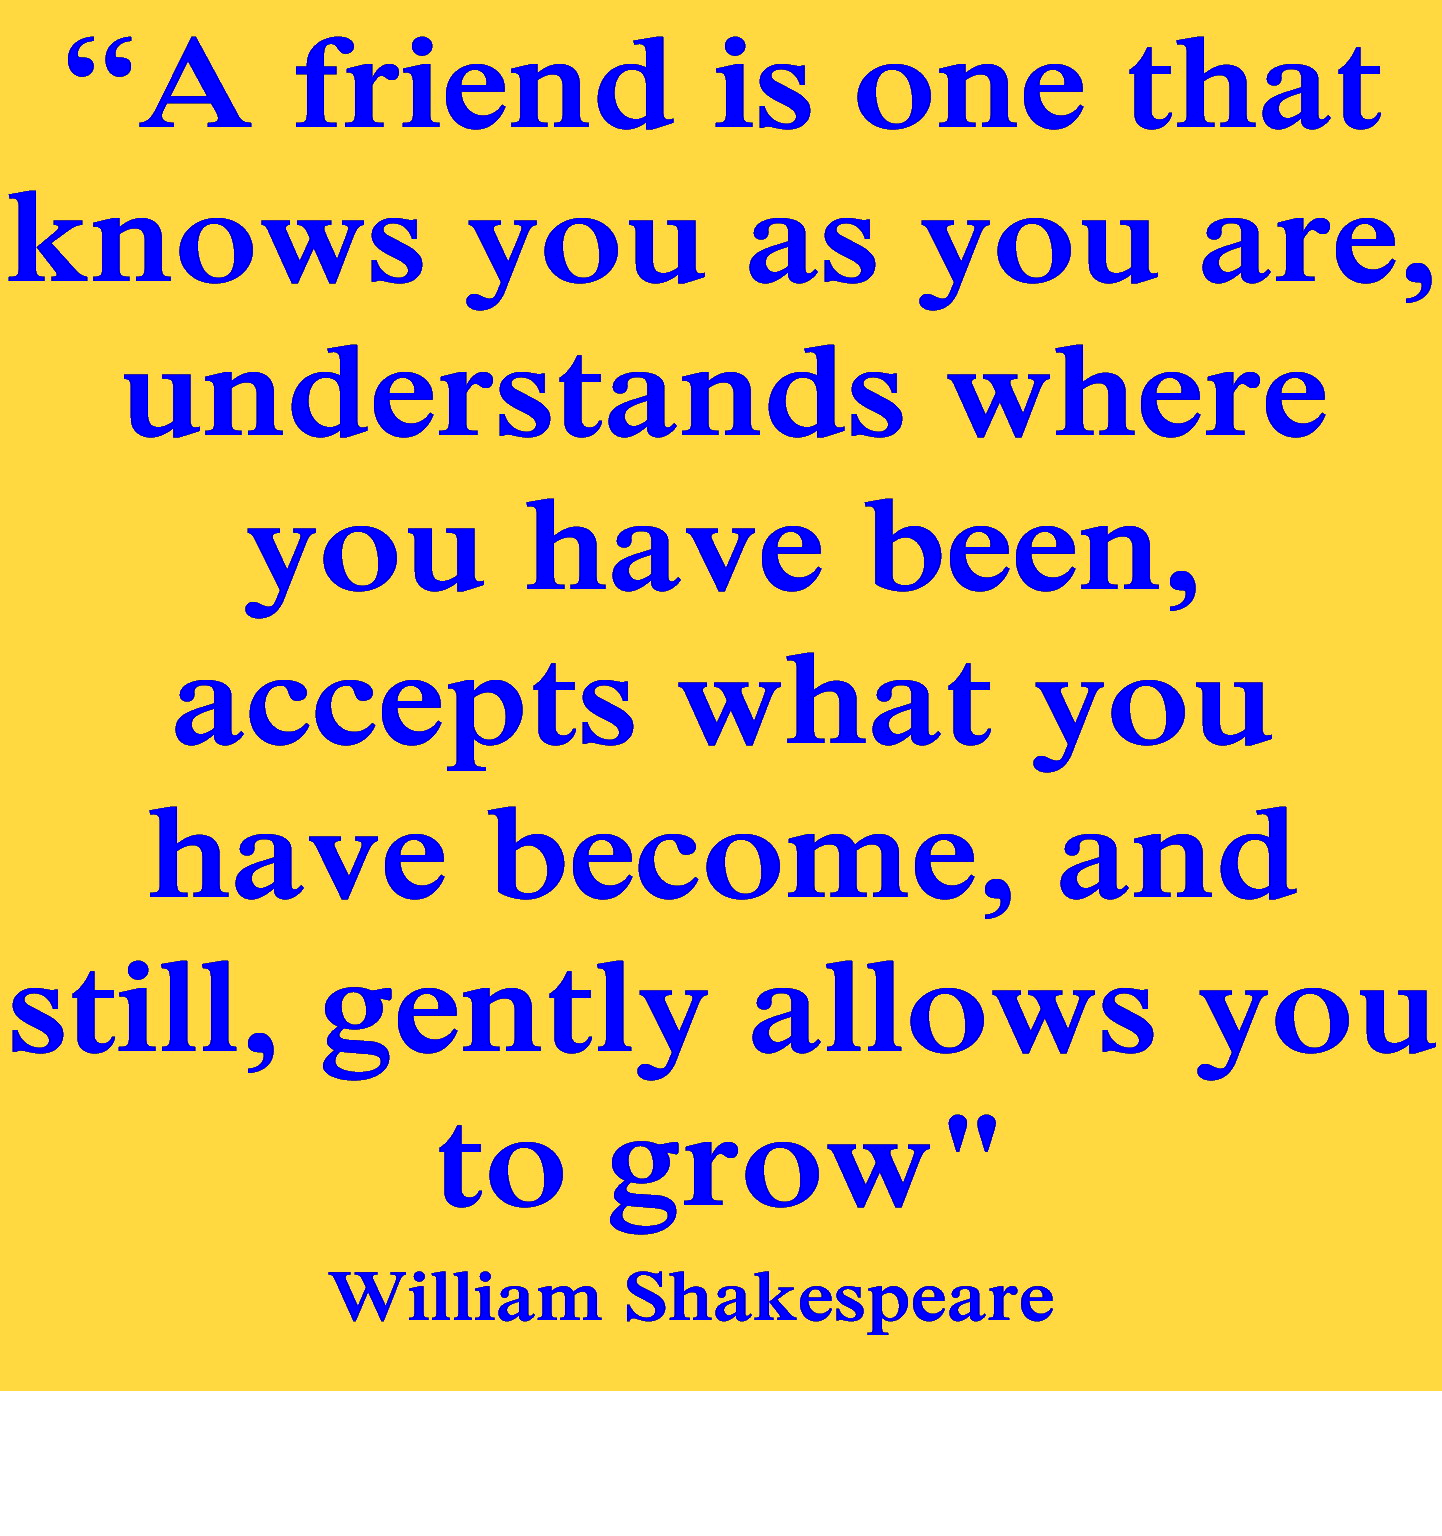 002 Qualities Of Good Friends Essay Lqs178 Amazing A Friend In Hindi Short Full